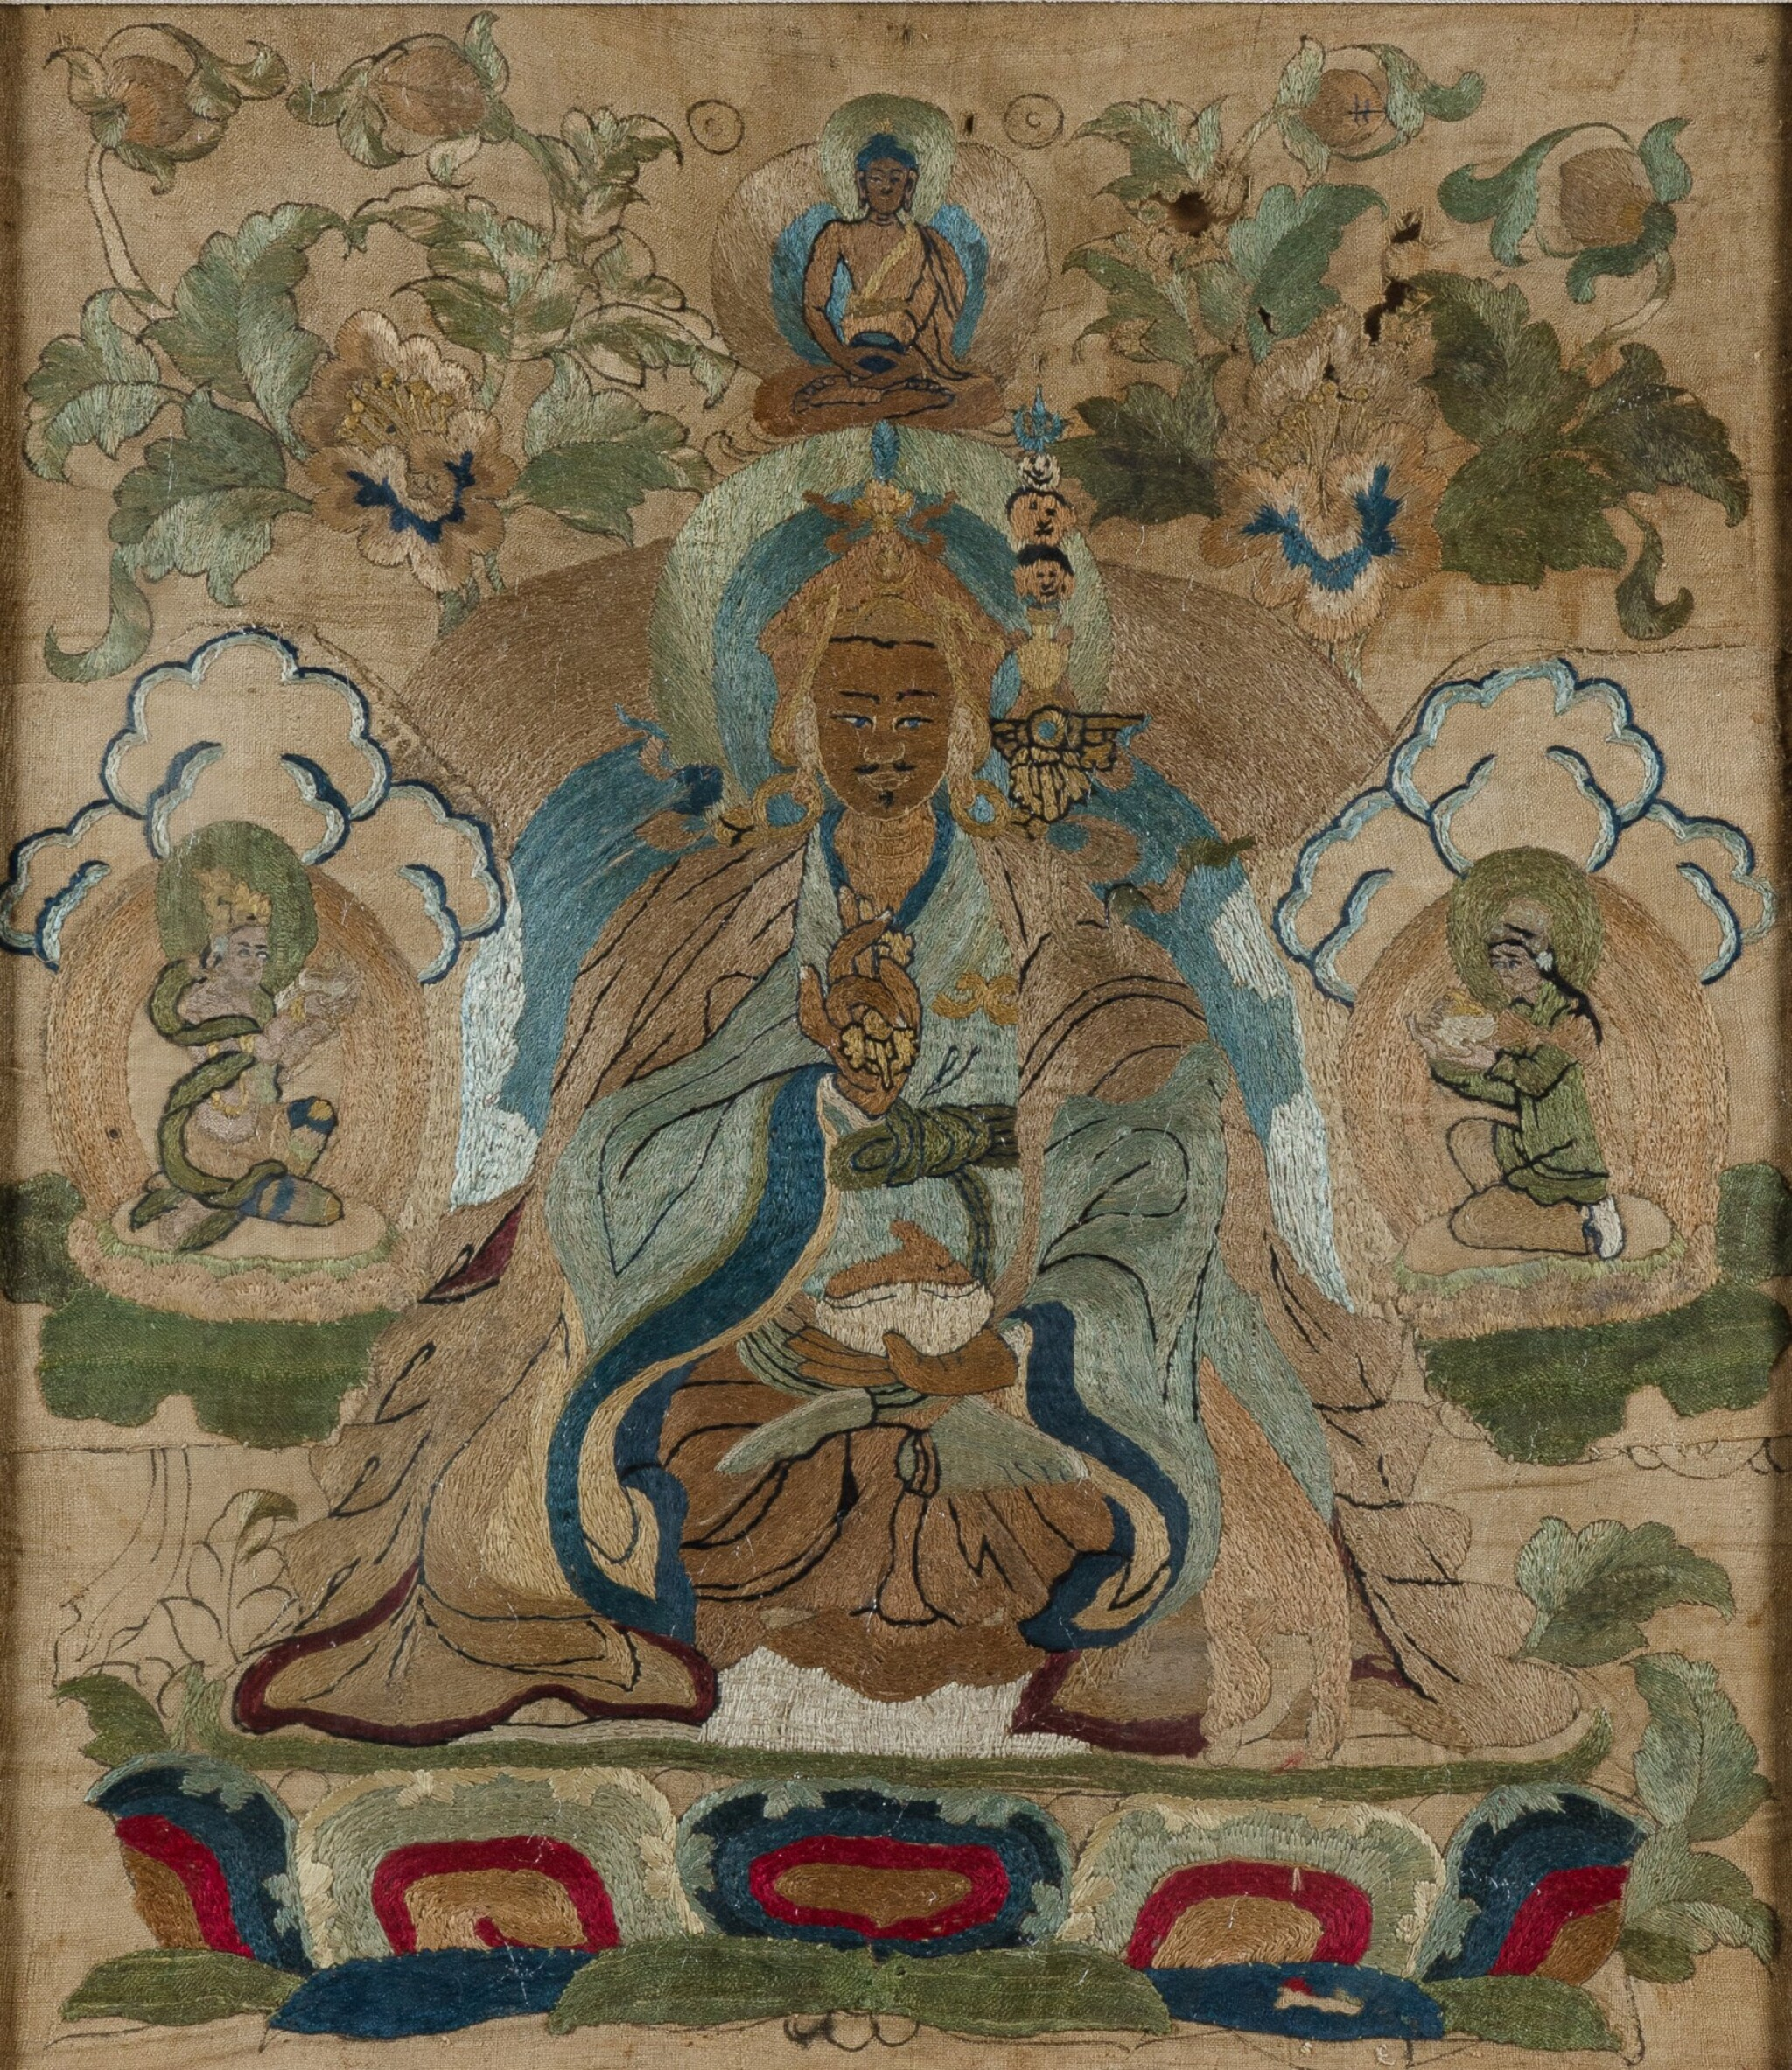 View 1 of Lot 25. Petit tangka représentant Padmasambhava Dynastie Qing, XVIIIE siècle | 清十八世紀 刺繡蓮花生大士唐卡 | A small embroidered silk thangka depicting Padmasambhava, Qing Dynasty, 18th century.